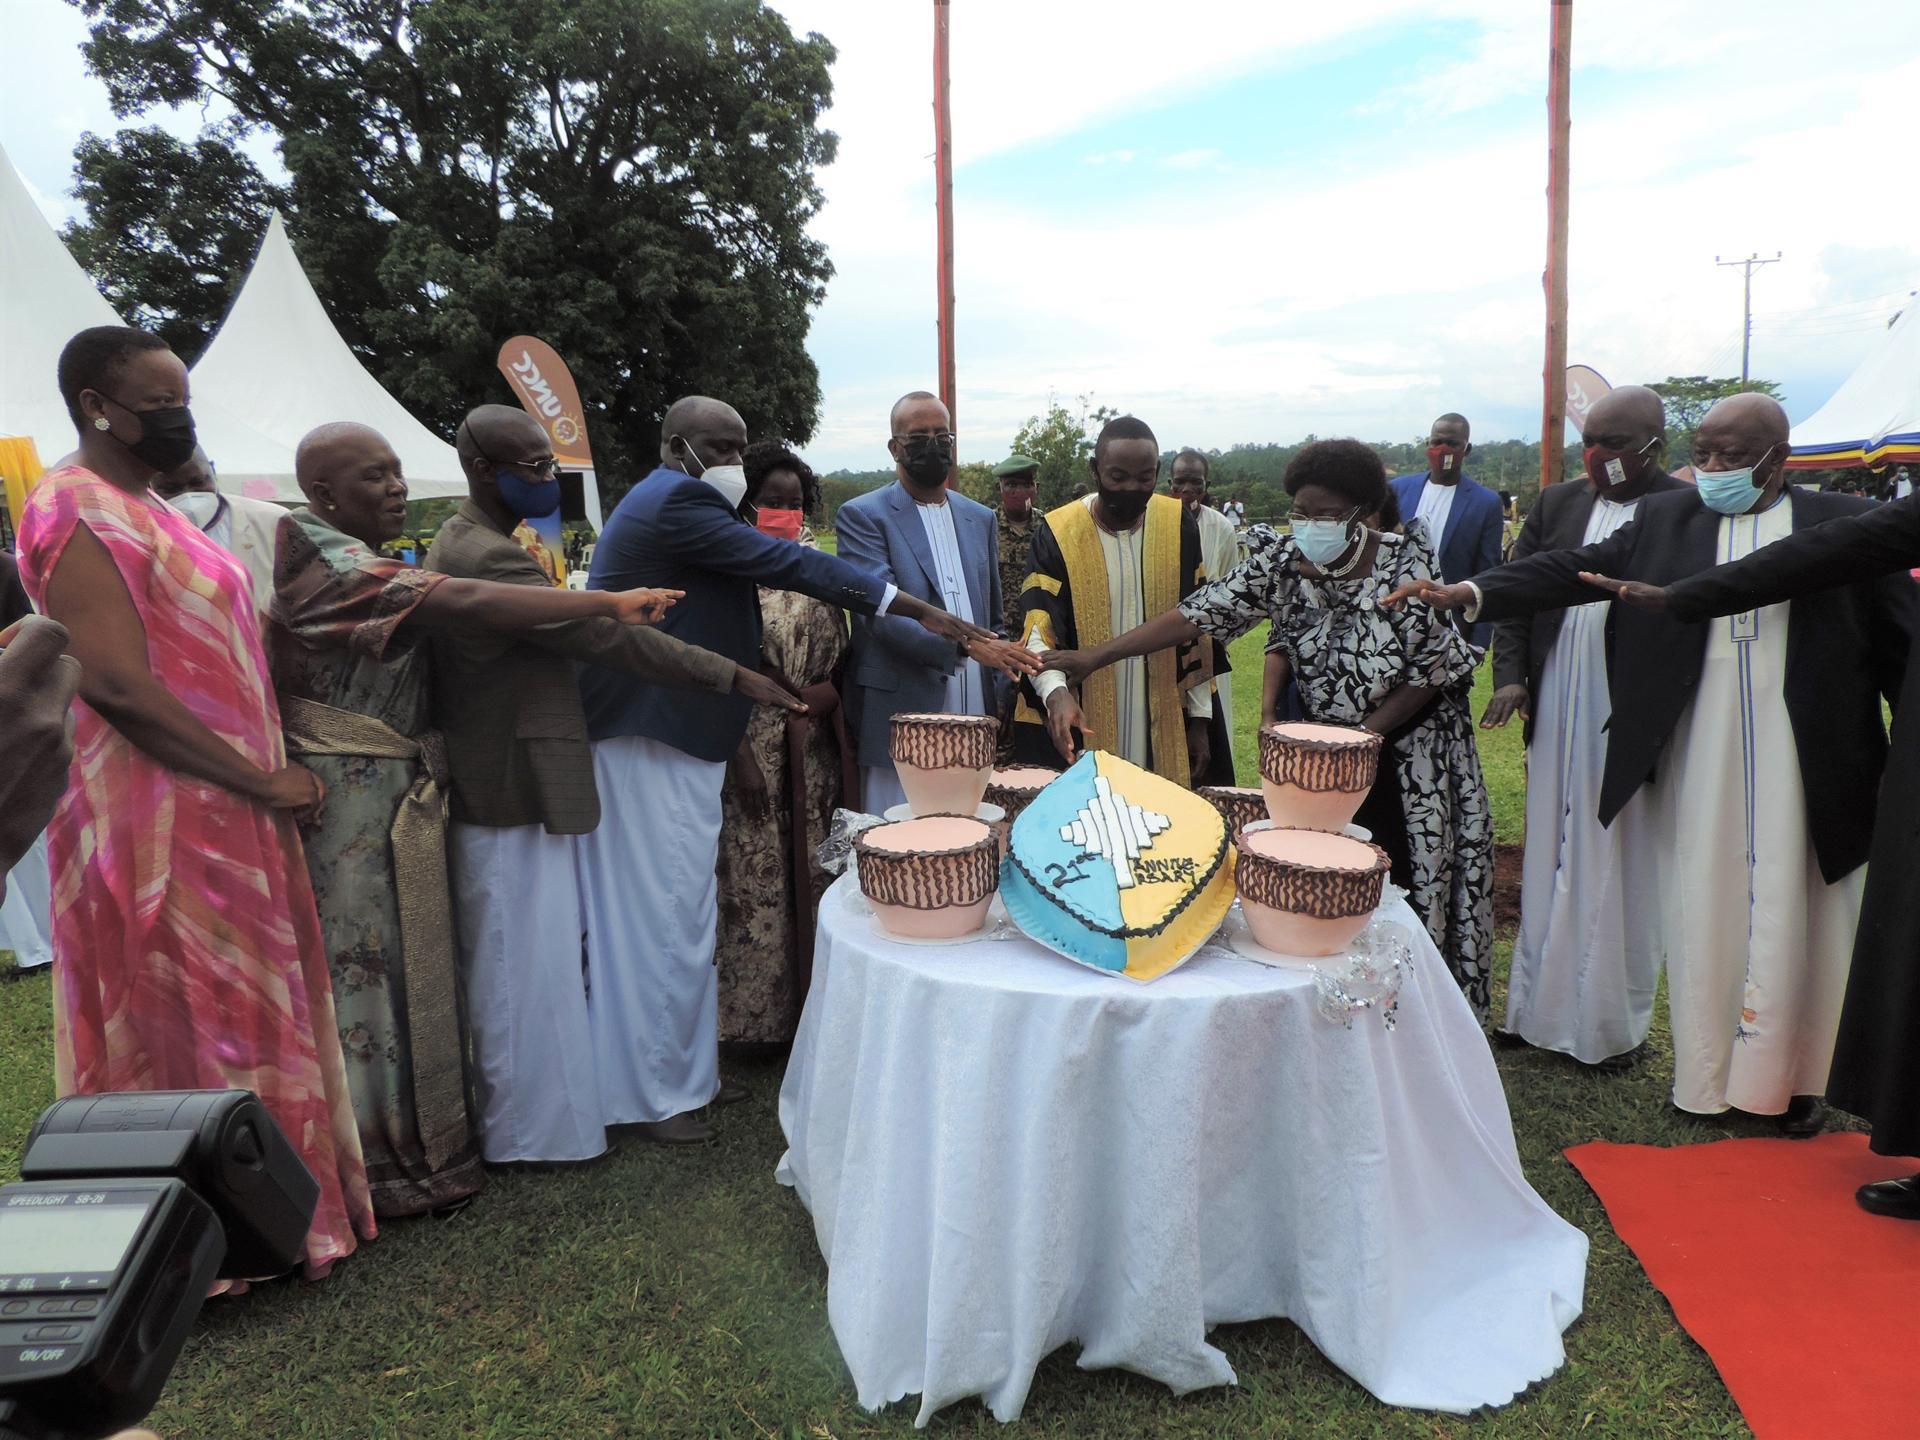 Kyabazinga calls for unity, peace at 21st anniversary